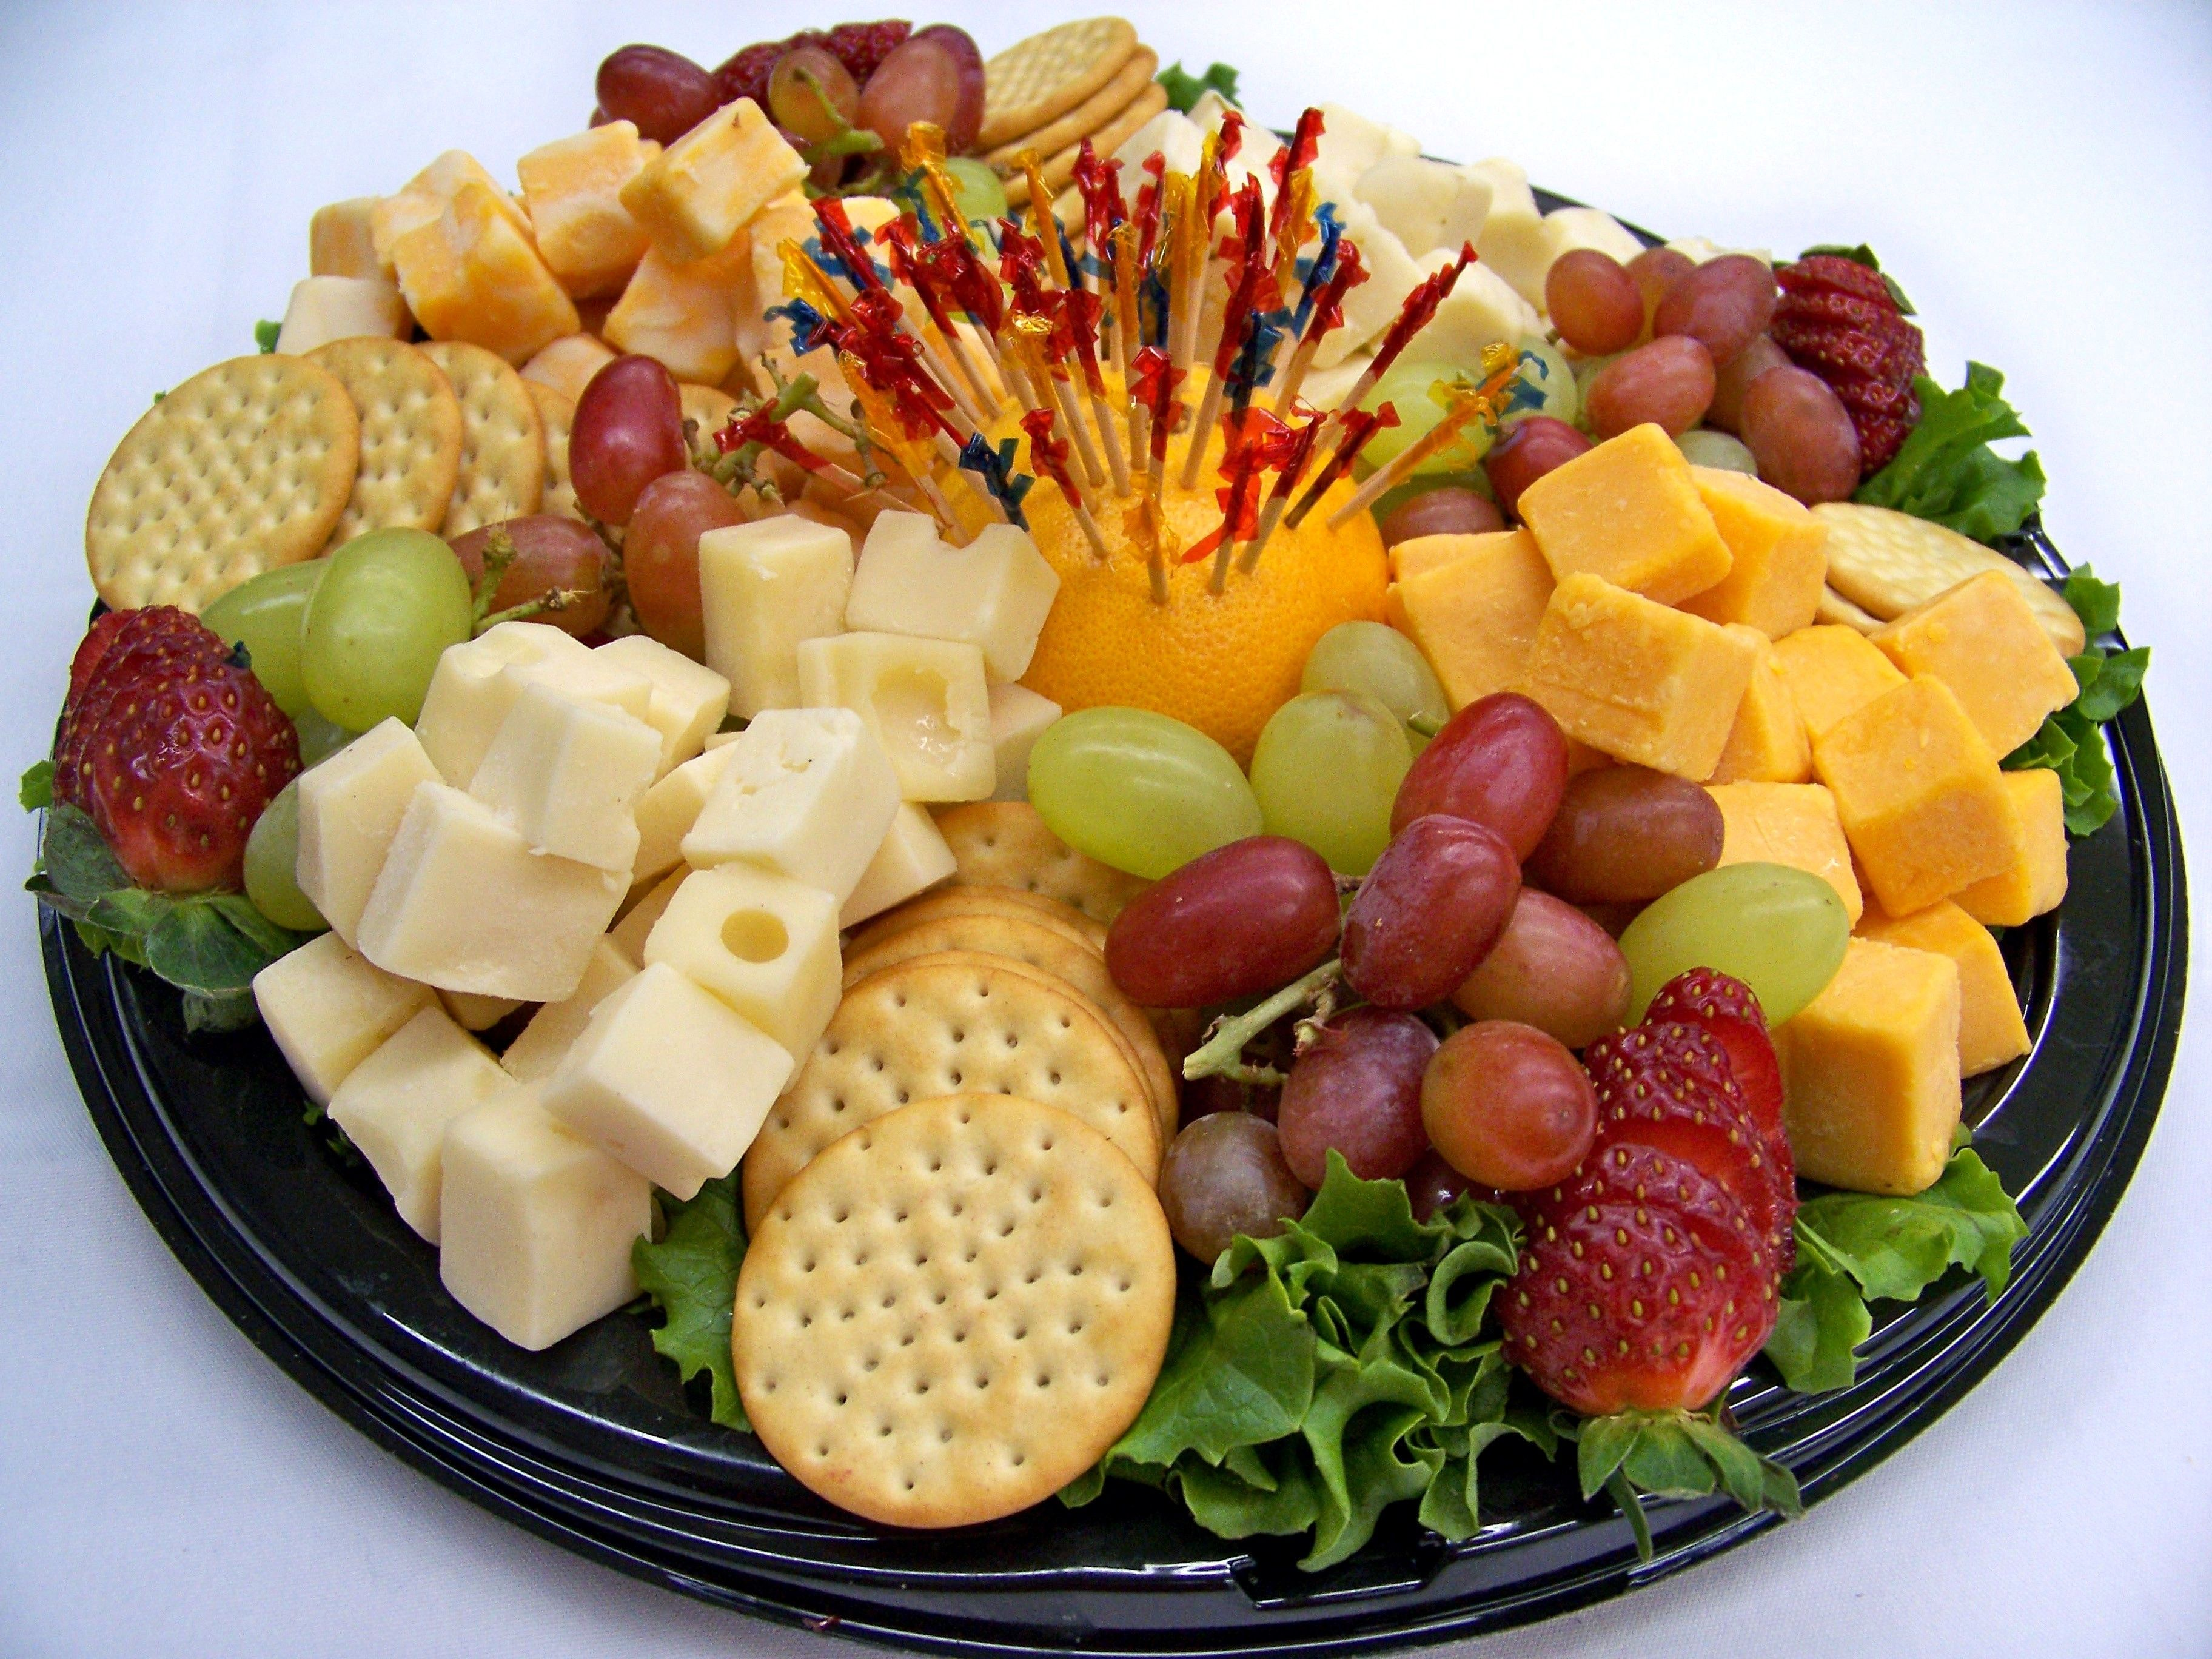 сырная тарелка фото как-то